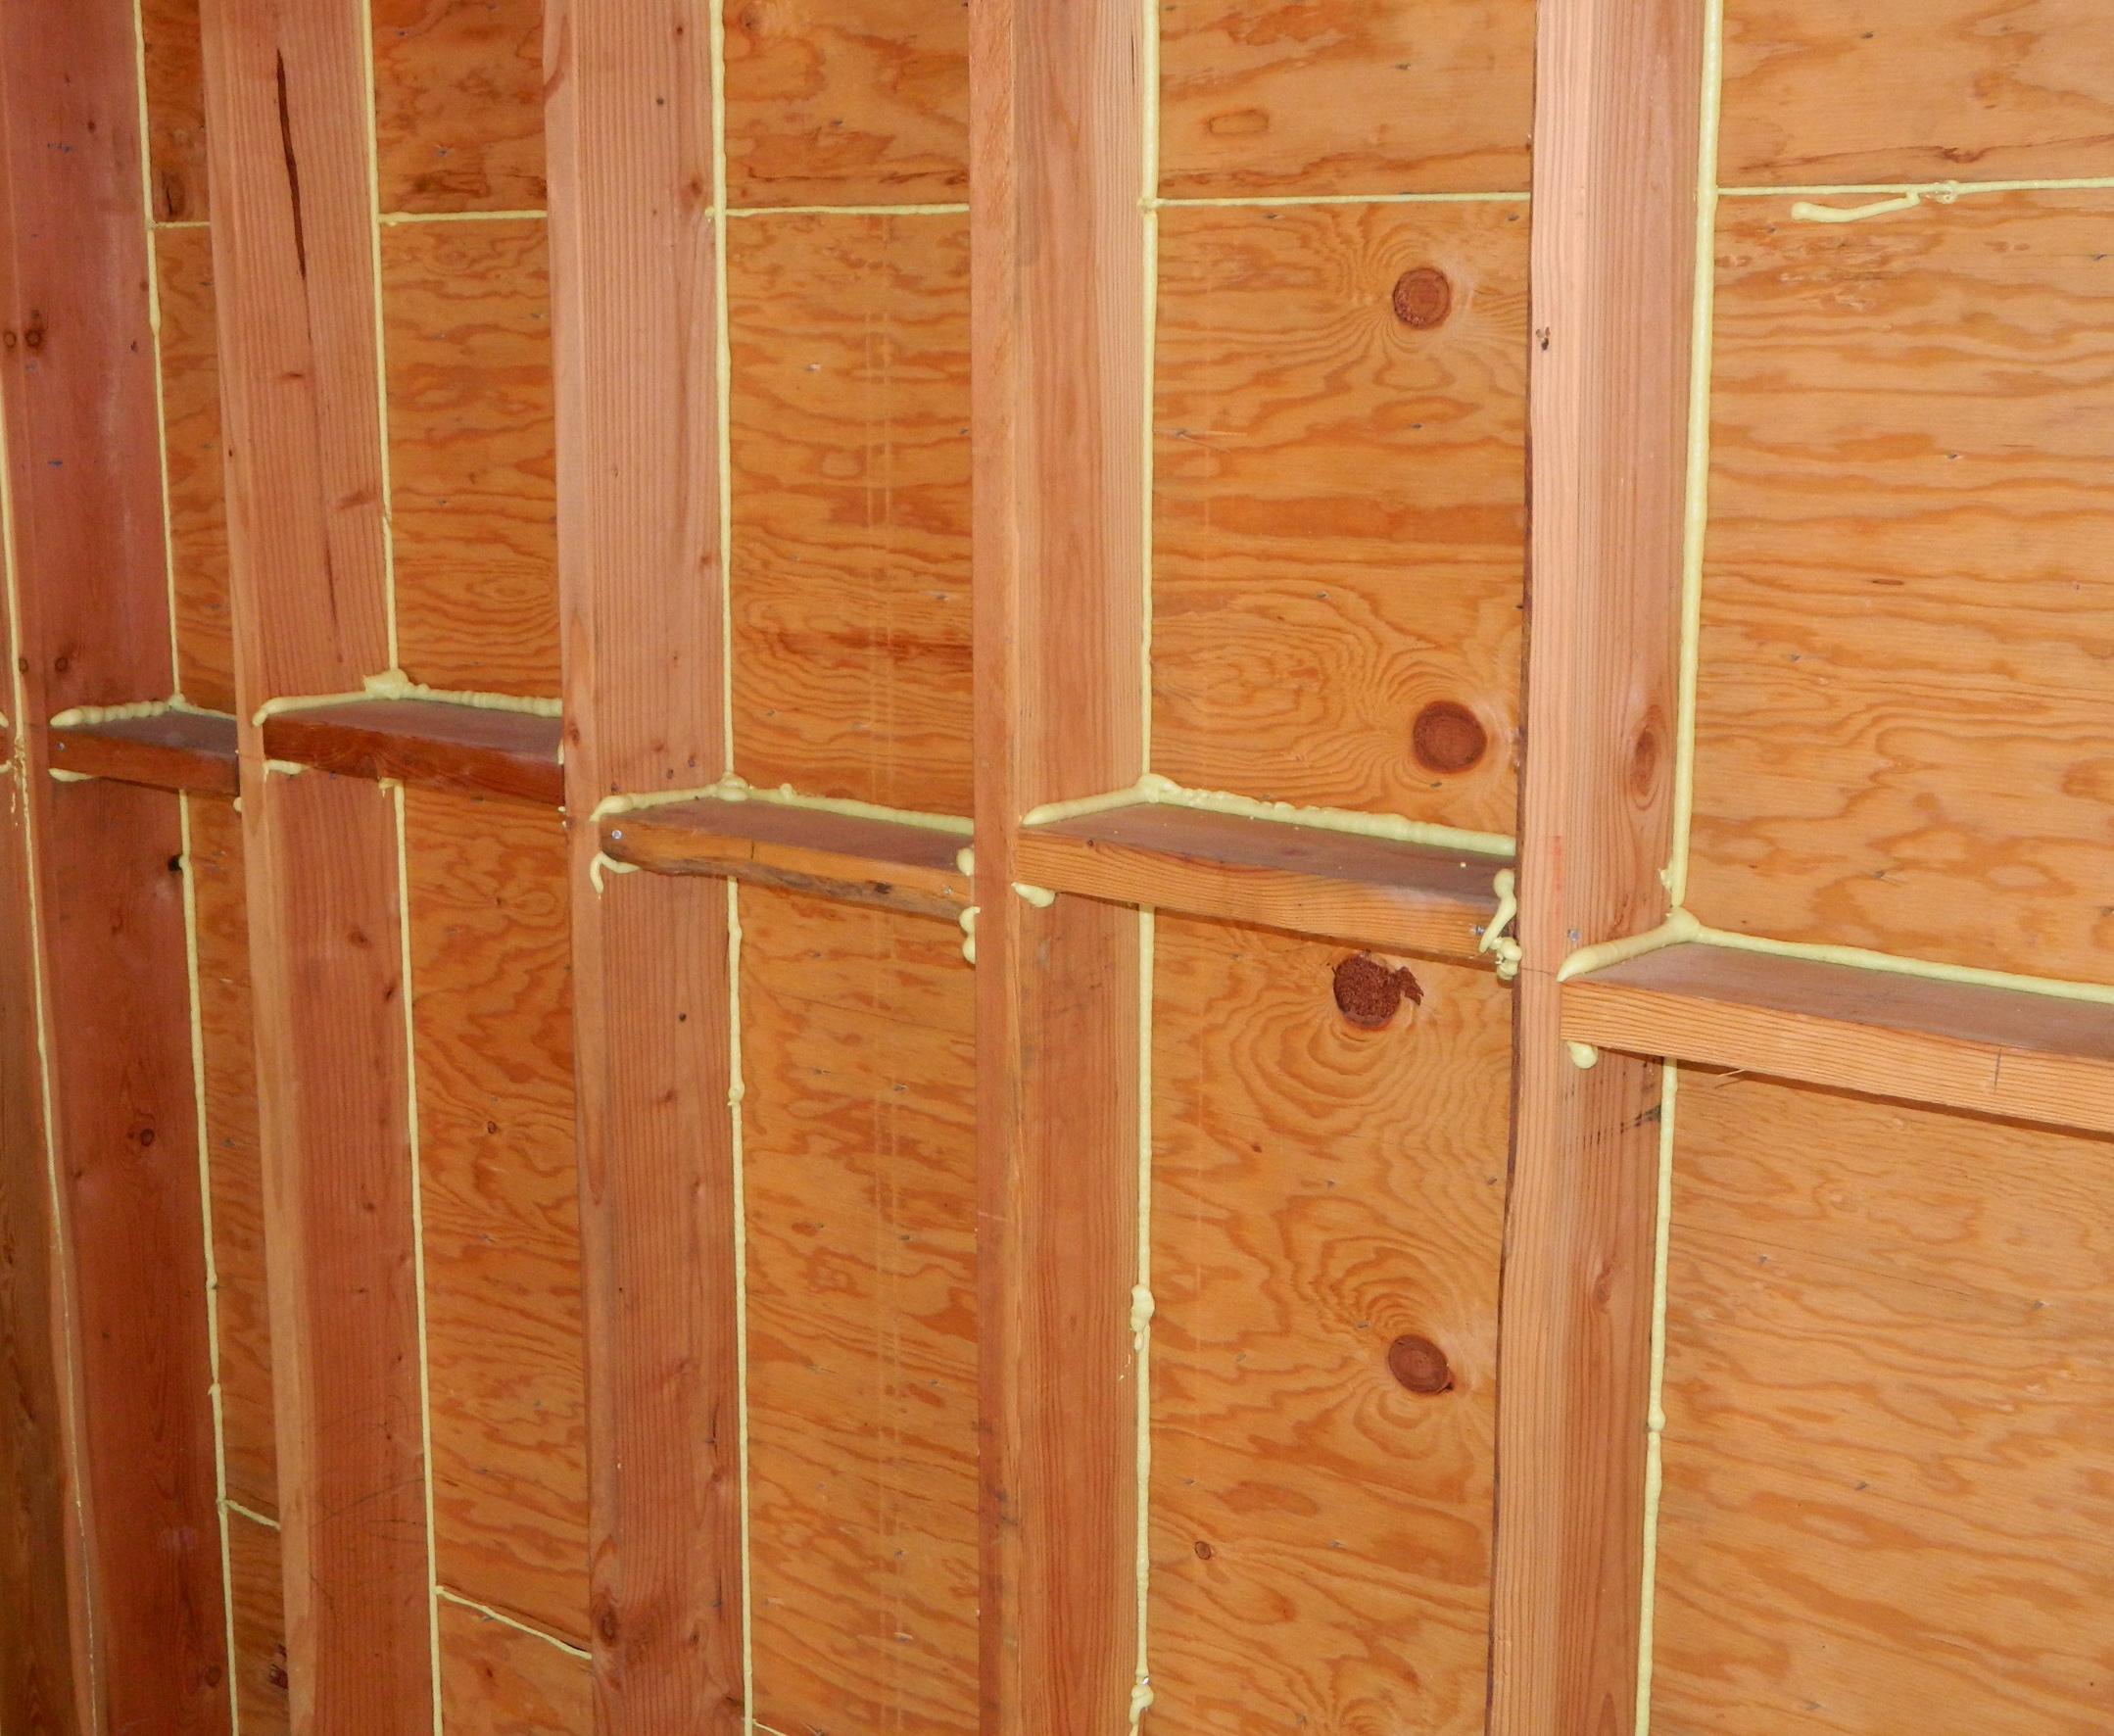 Sealed seams prior to insulation